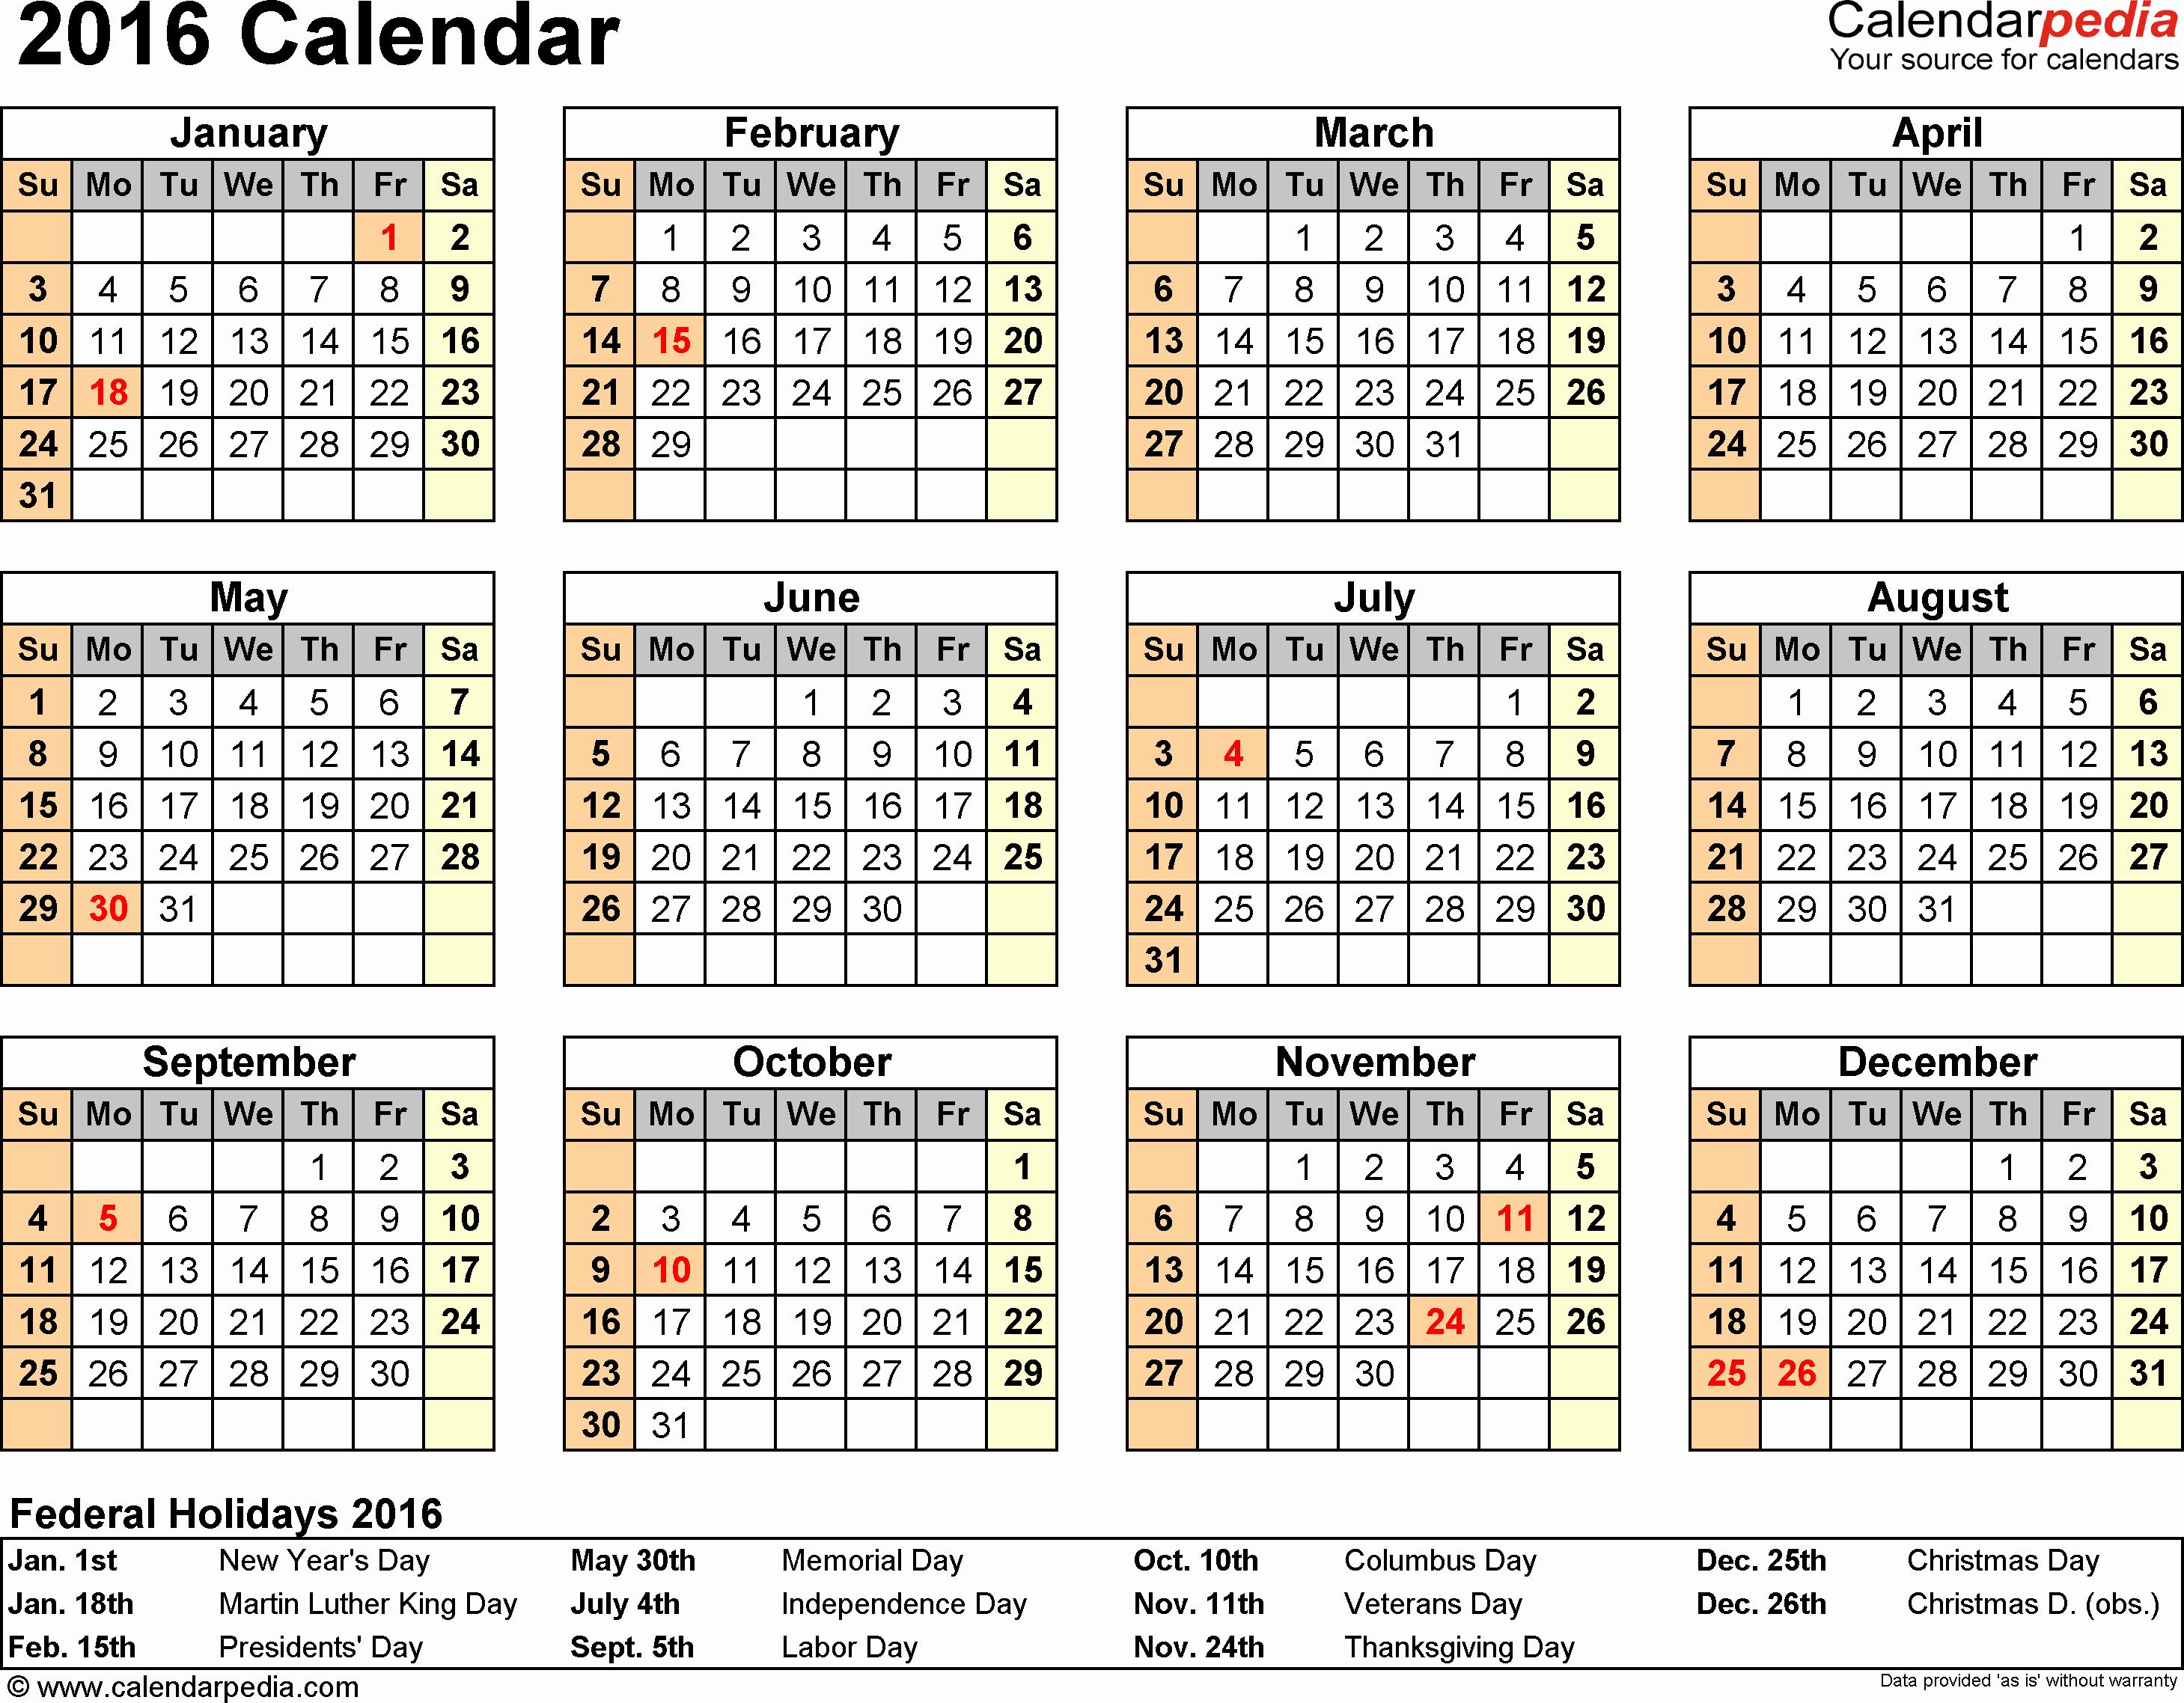 Free Printable Calendar 2016 Templates Luxury 2016 Calendar 16 Free Printable Word Calendar Templates